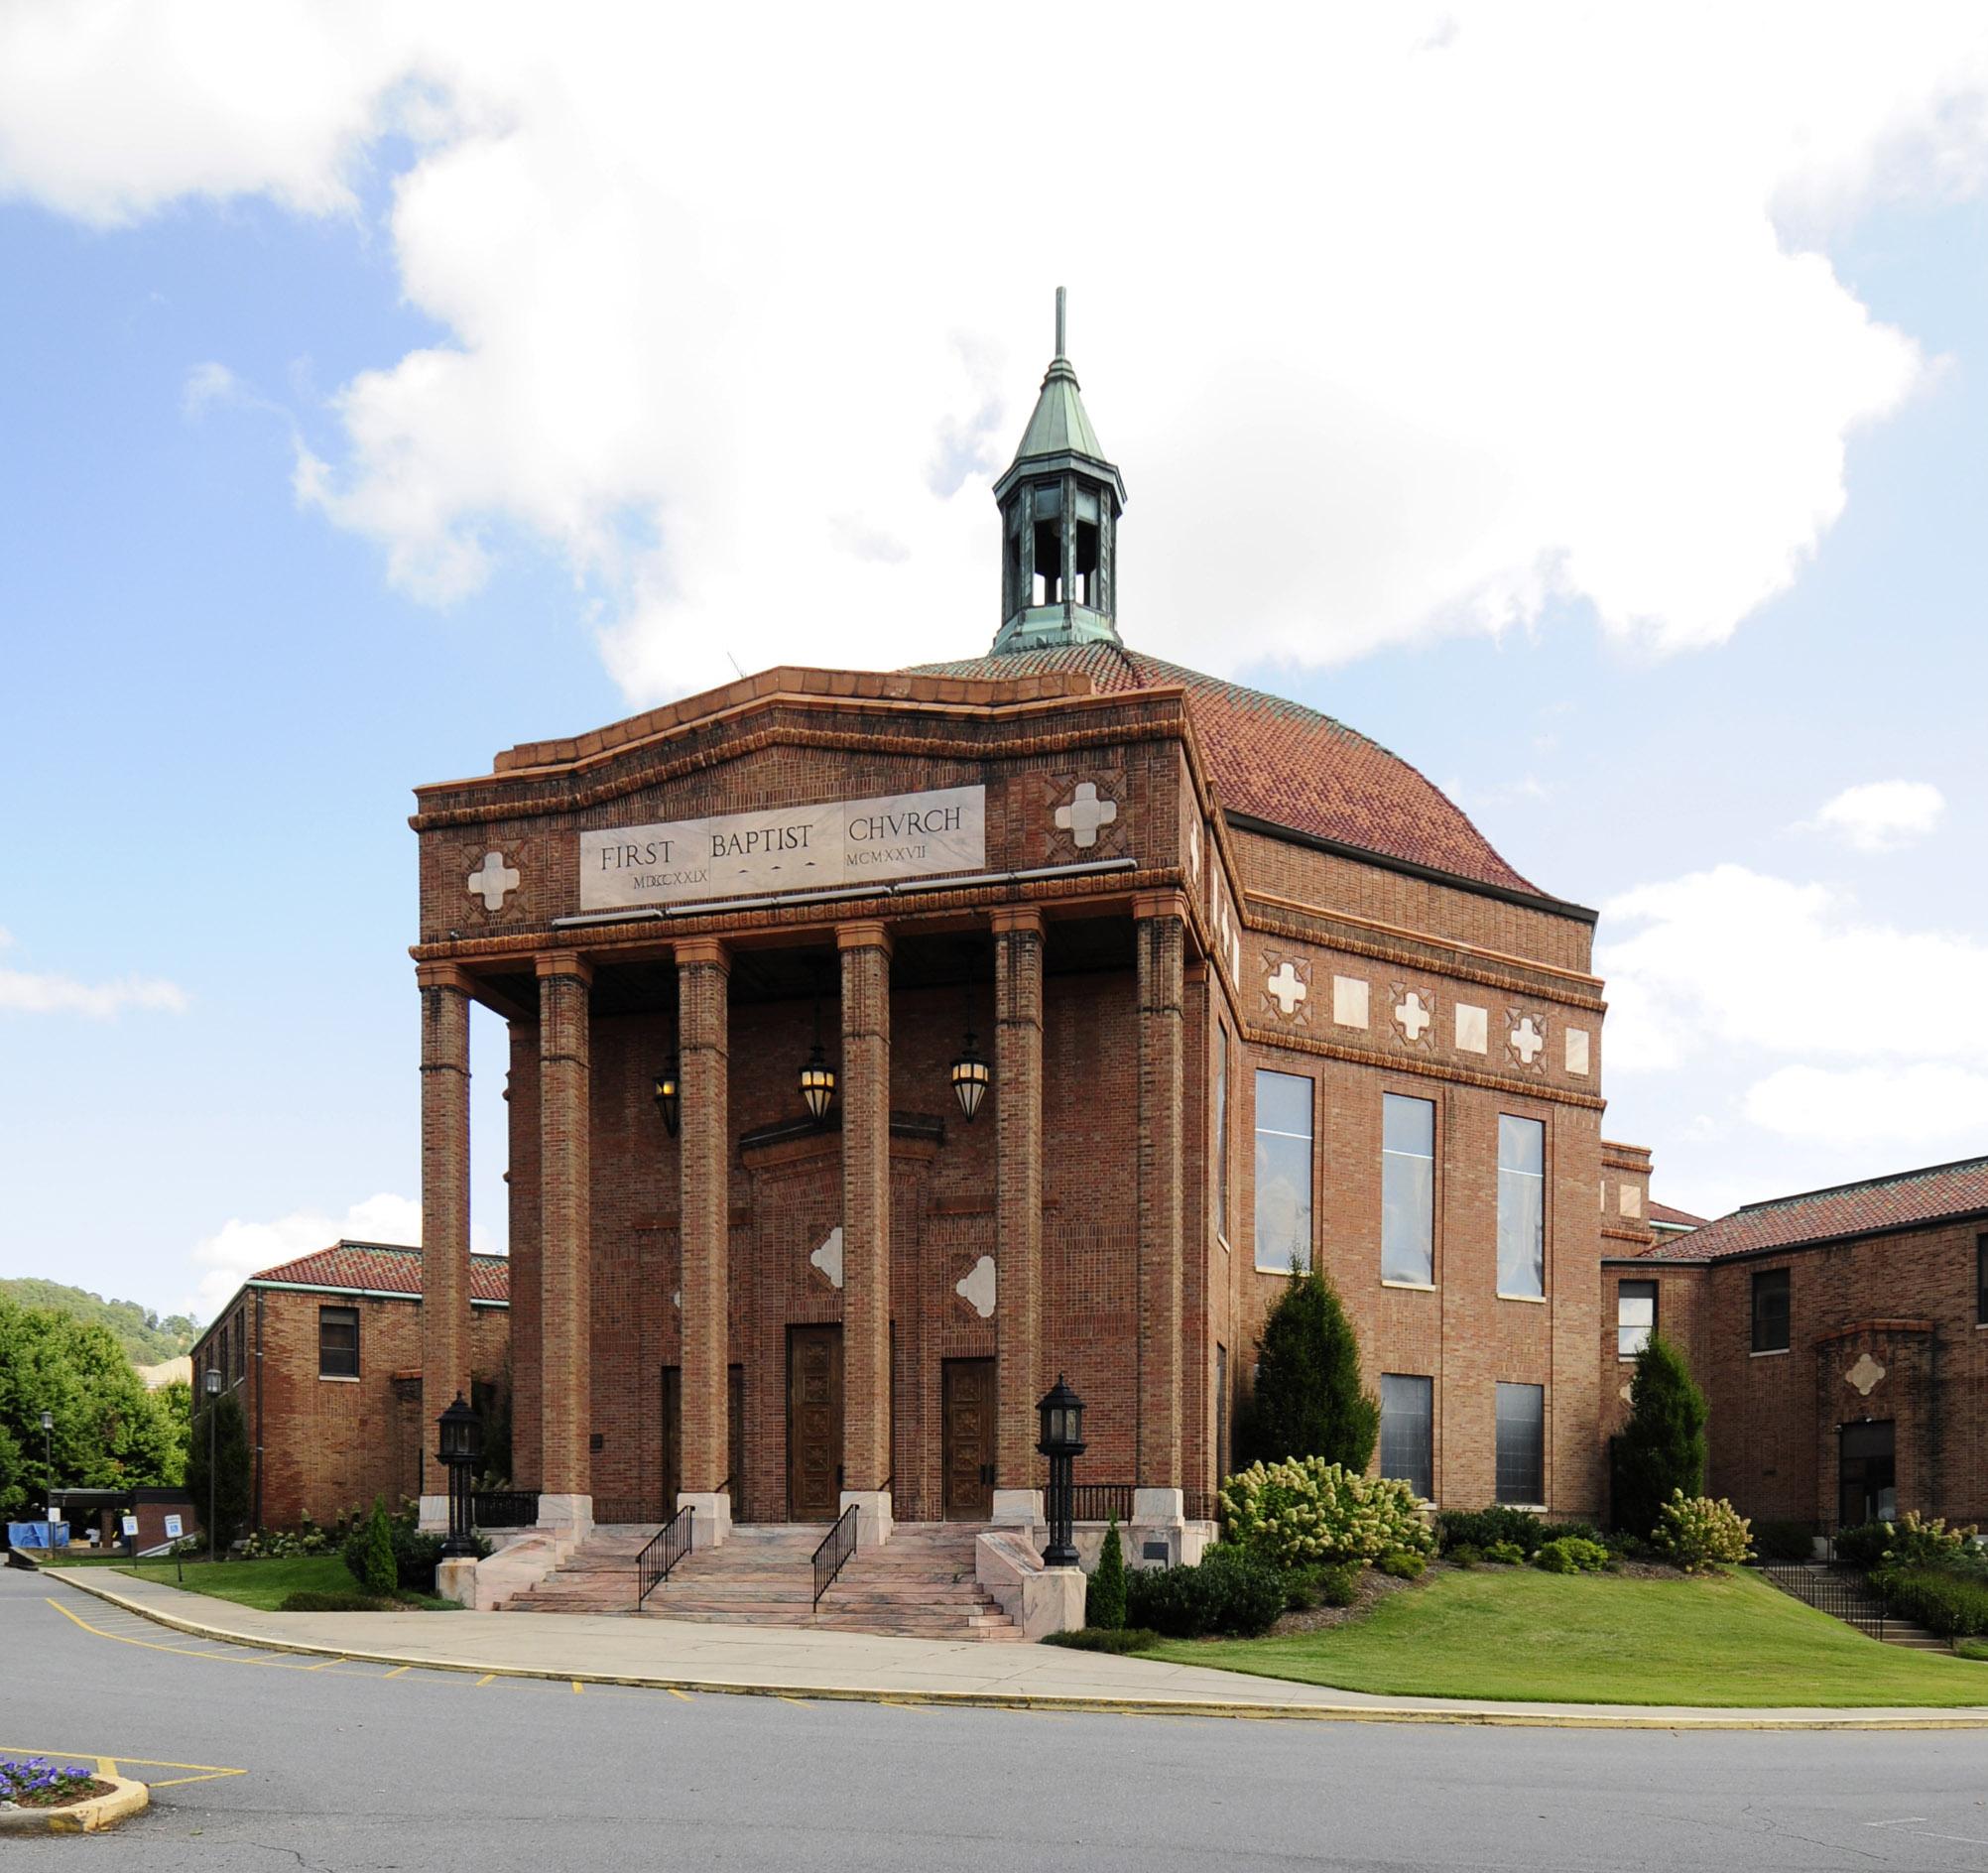 Amazing Churches In Asheville #1: First_Baptist_Church_Asheville.jpg